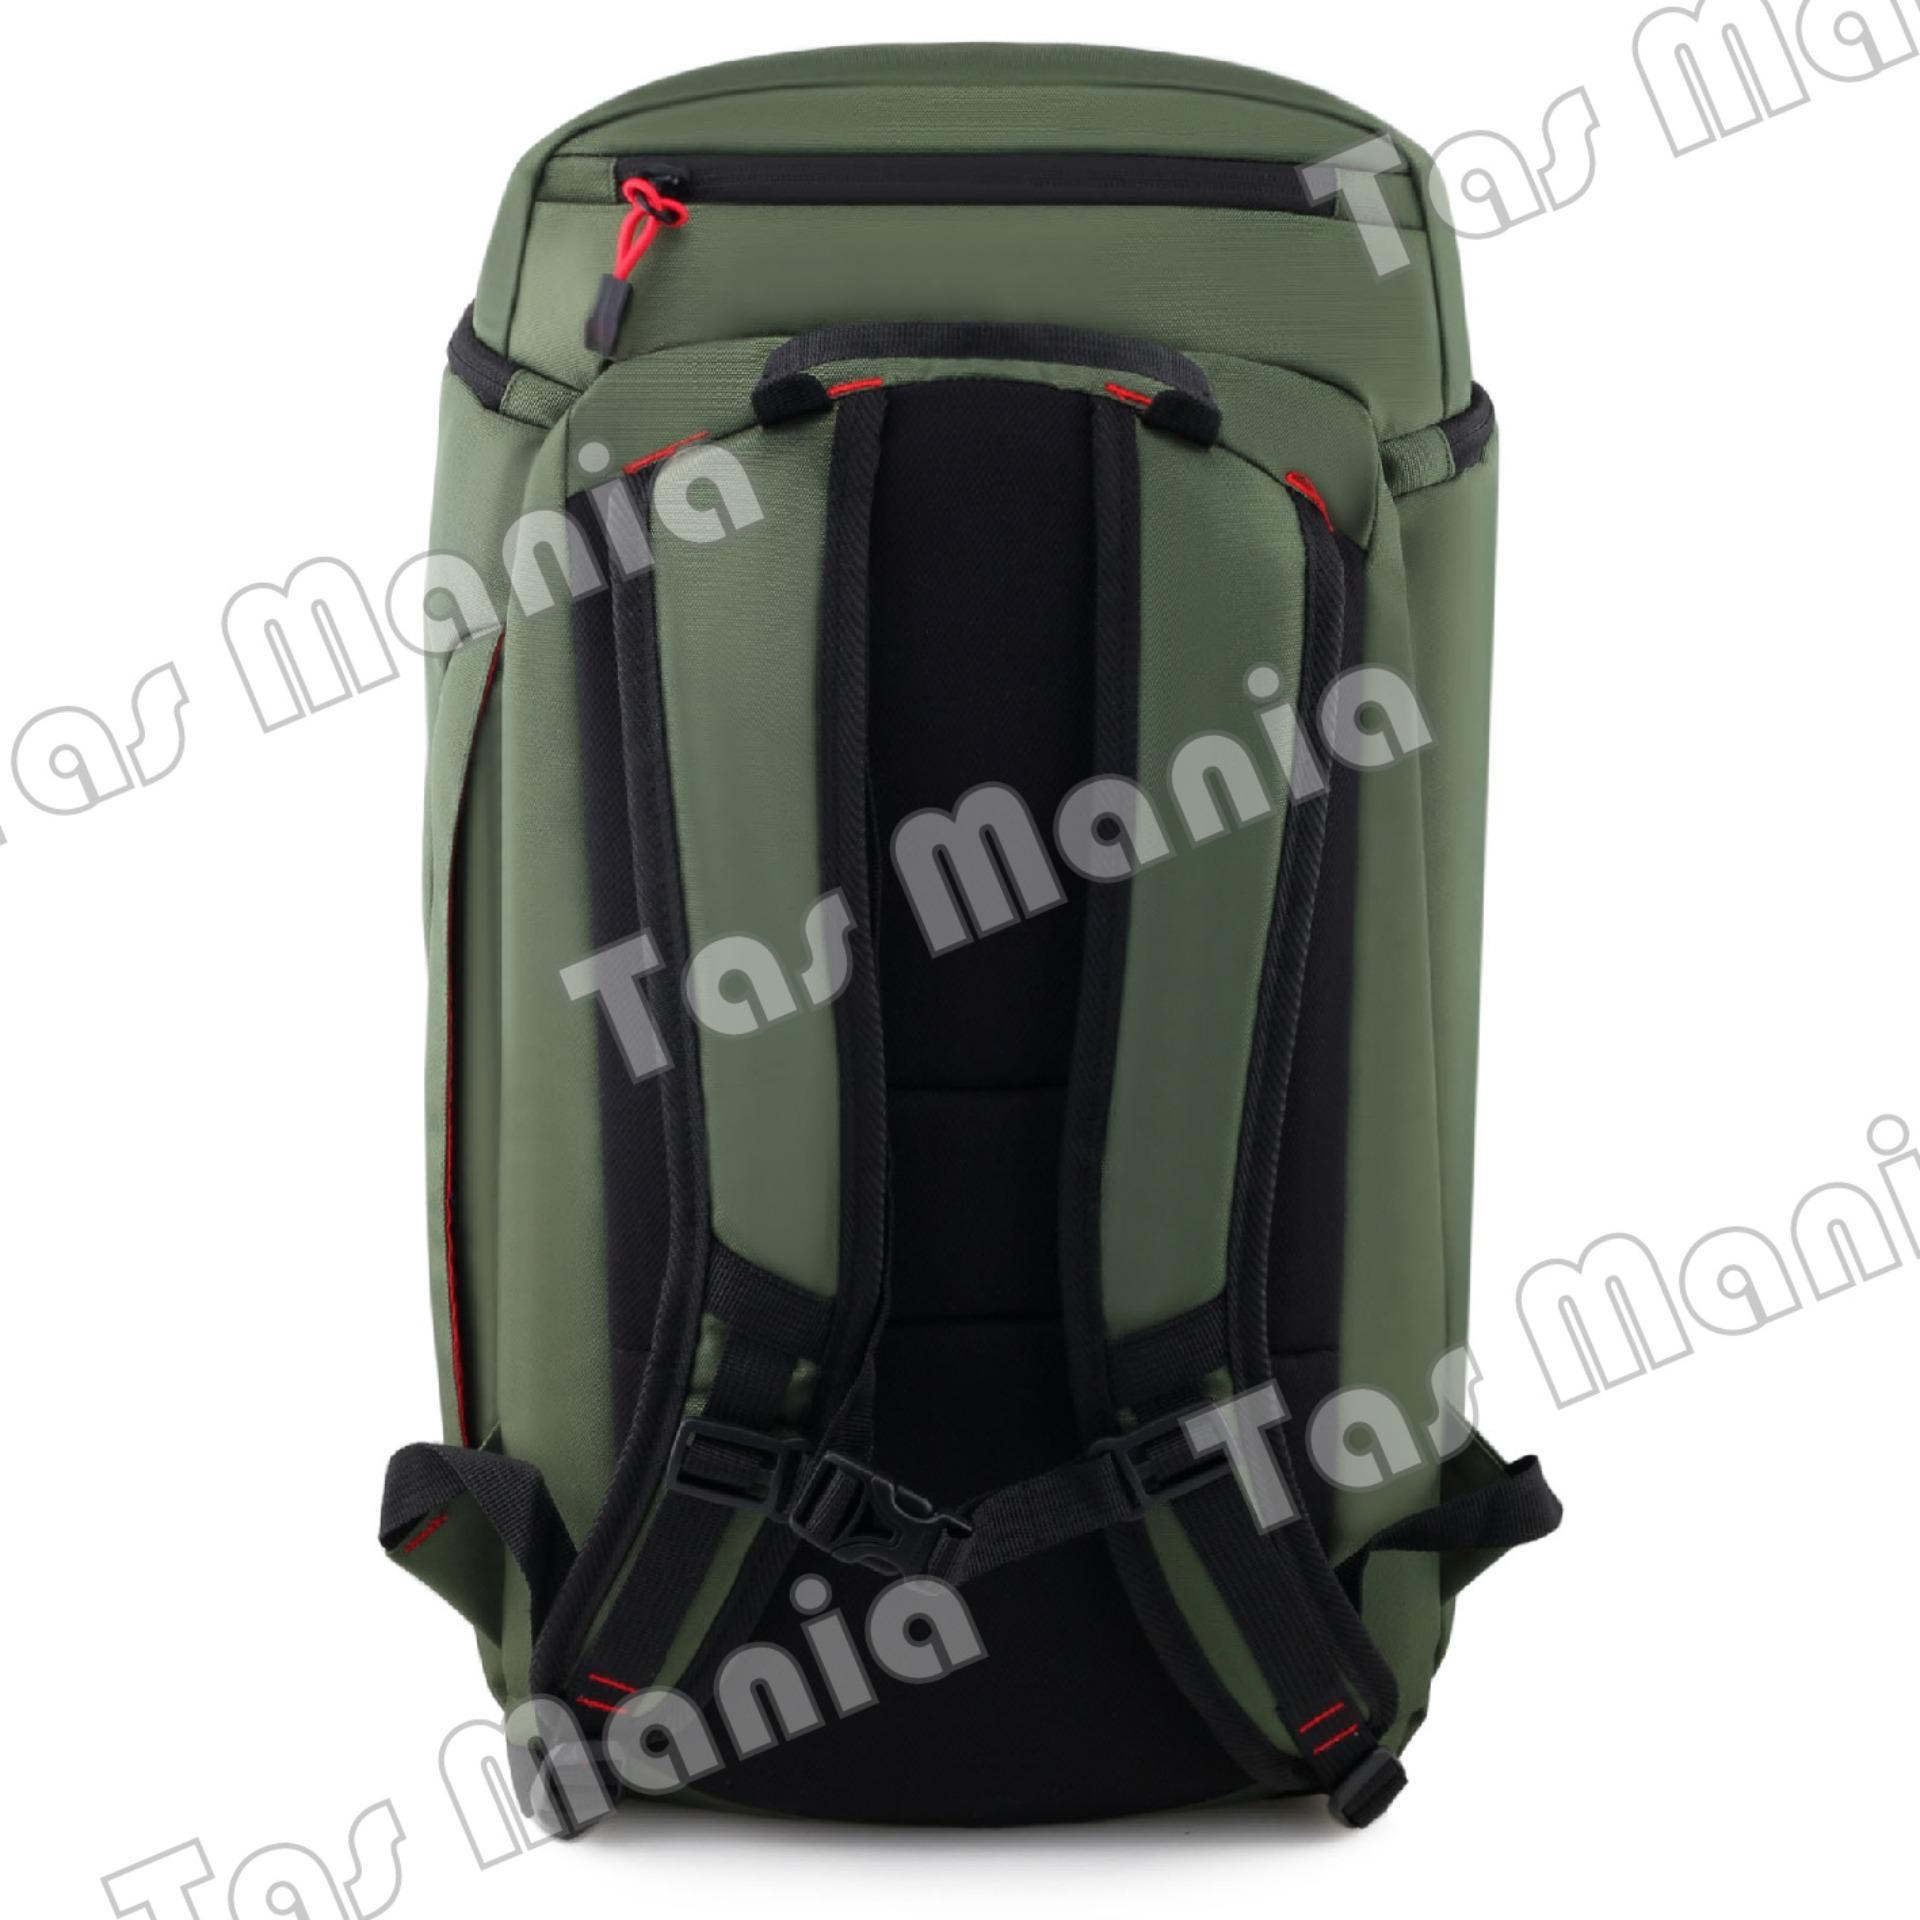 PROMO MUDIK LEBARAN - Tas Ransel Mudik / Carrier Gear Bag Rococo Authentic .